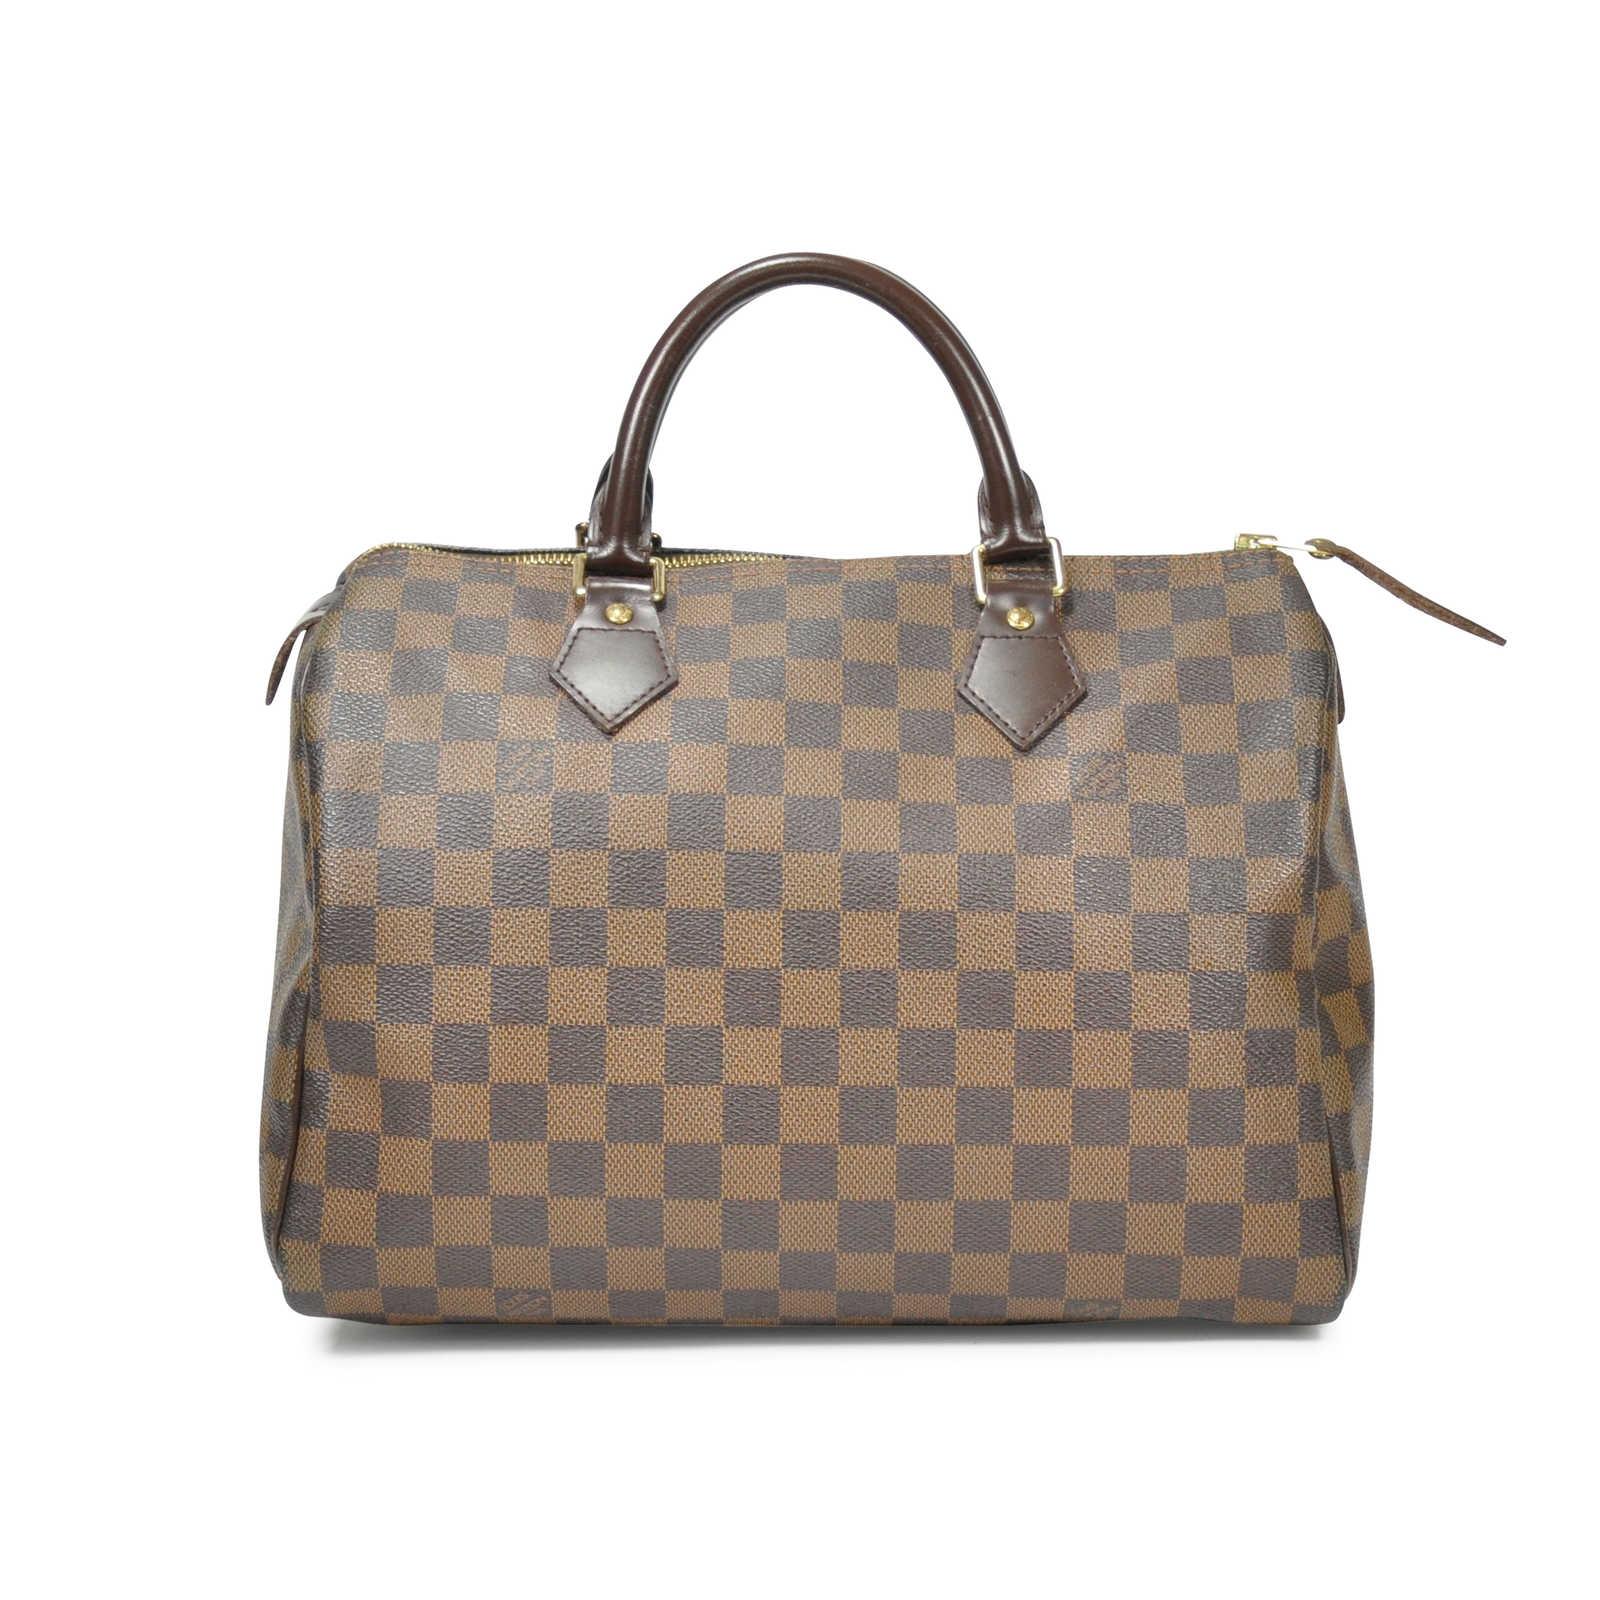 44db417800e7 Authentic Second Hand Louis Vuitton Speedy 30 (PSS-237-00006) - Thumbnail  ...